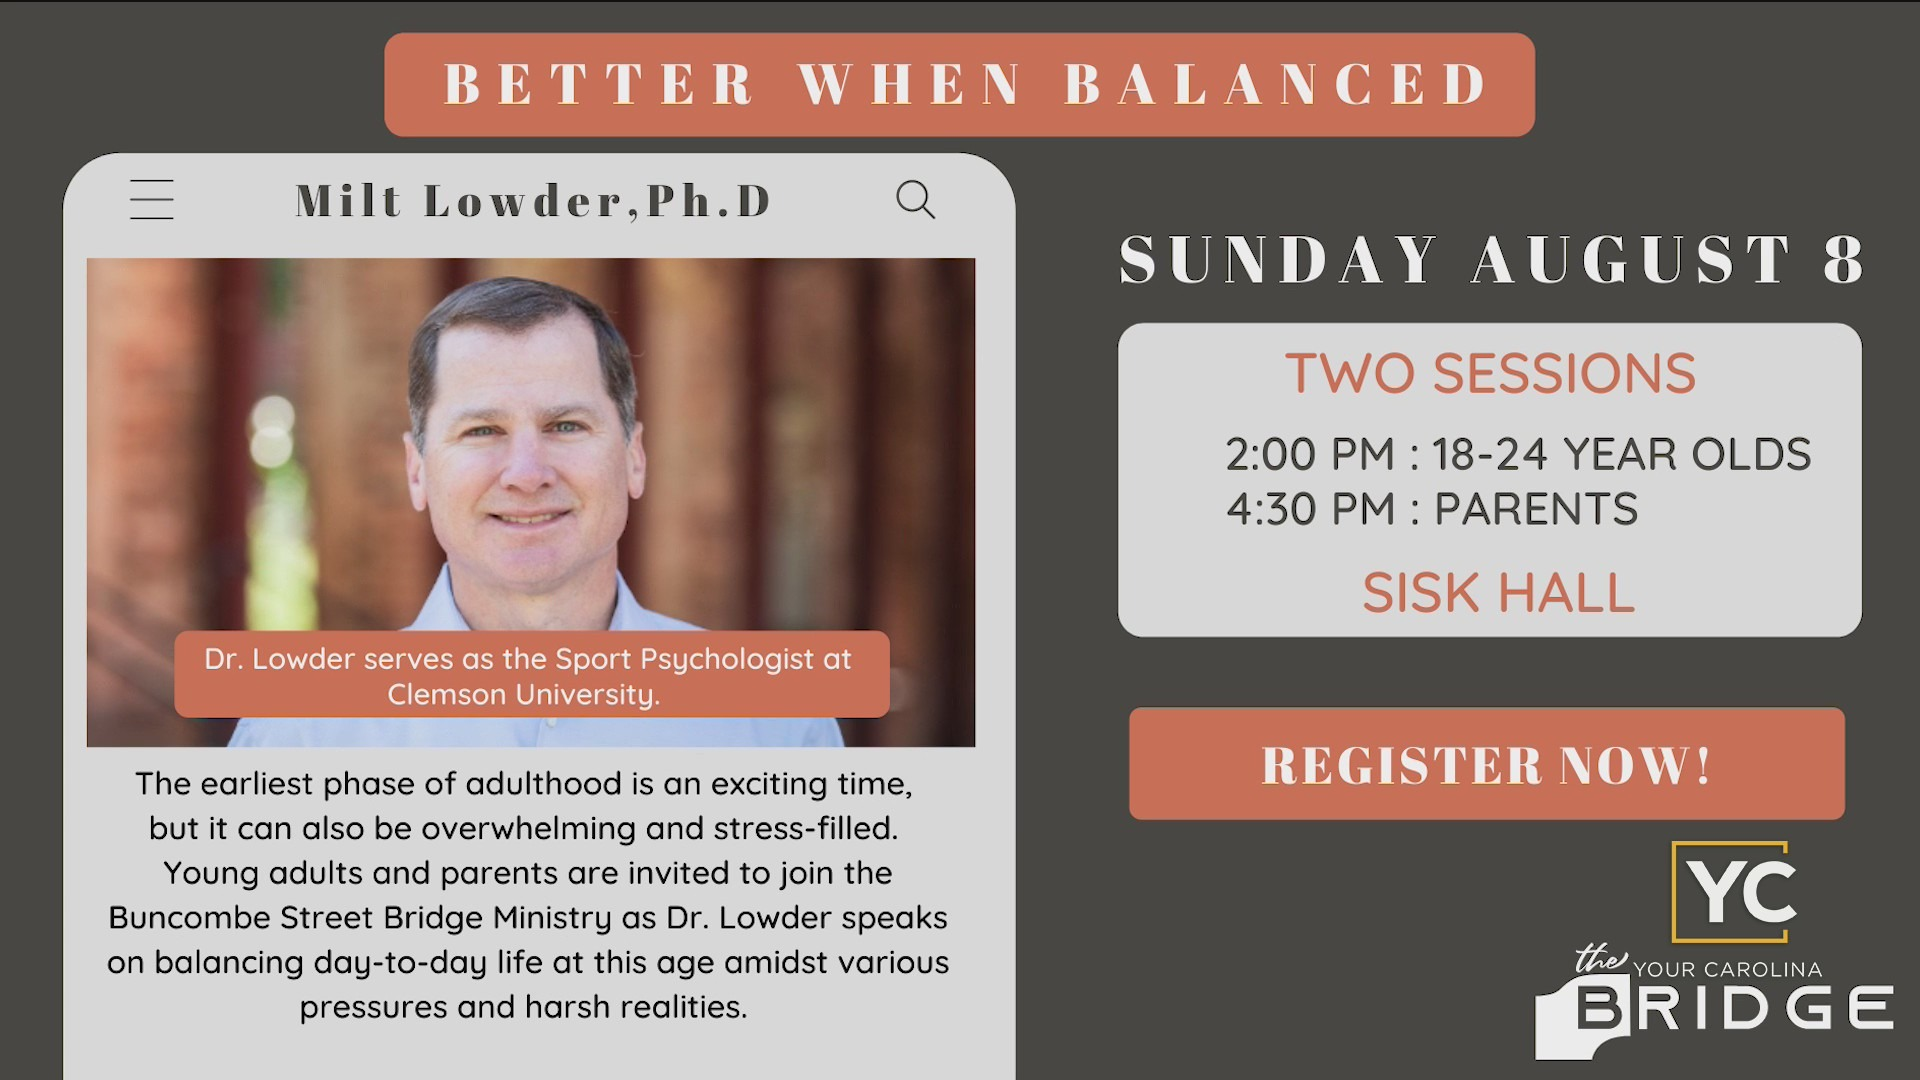 The BSUMC Bridge Ministry presents Better When Balanced